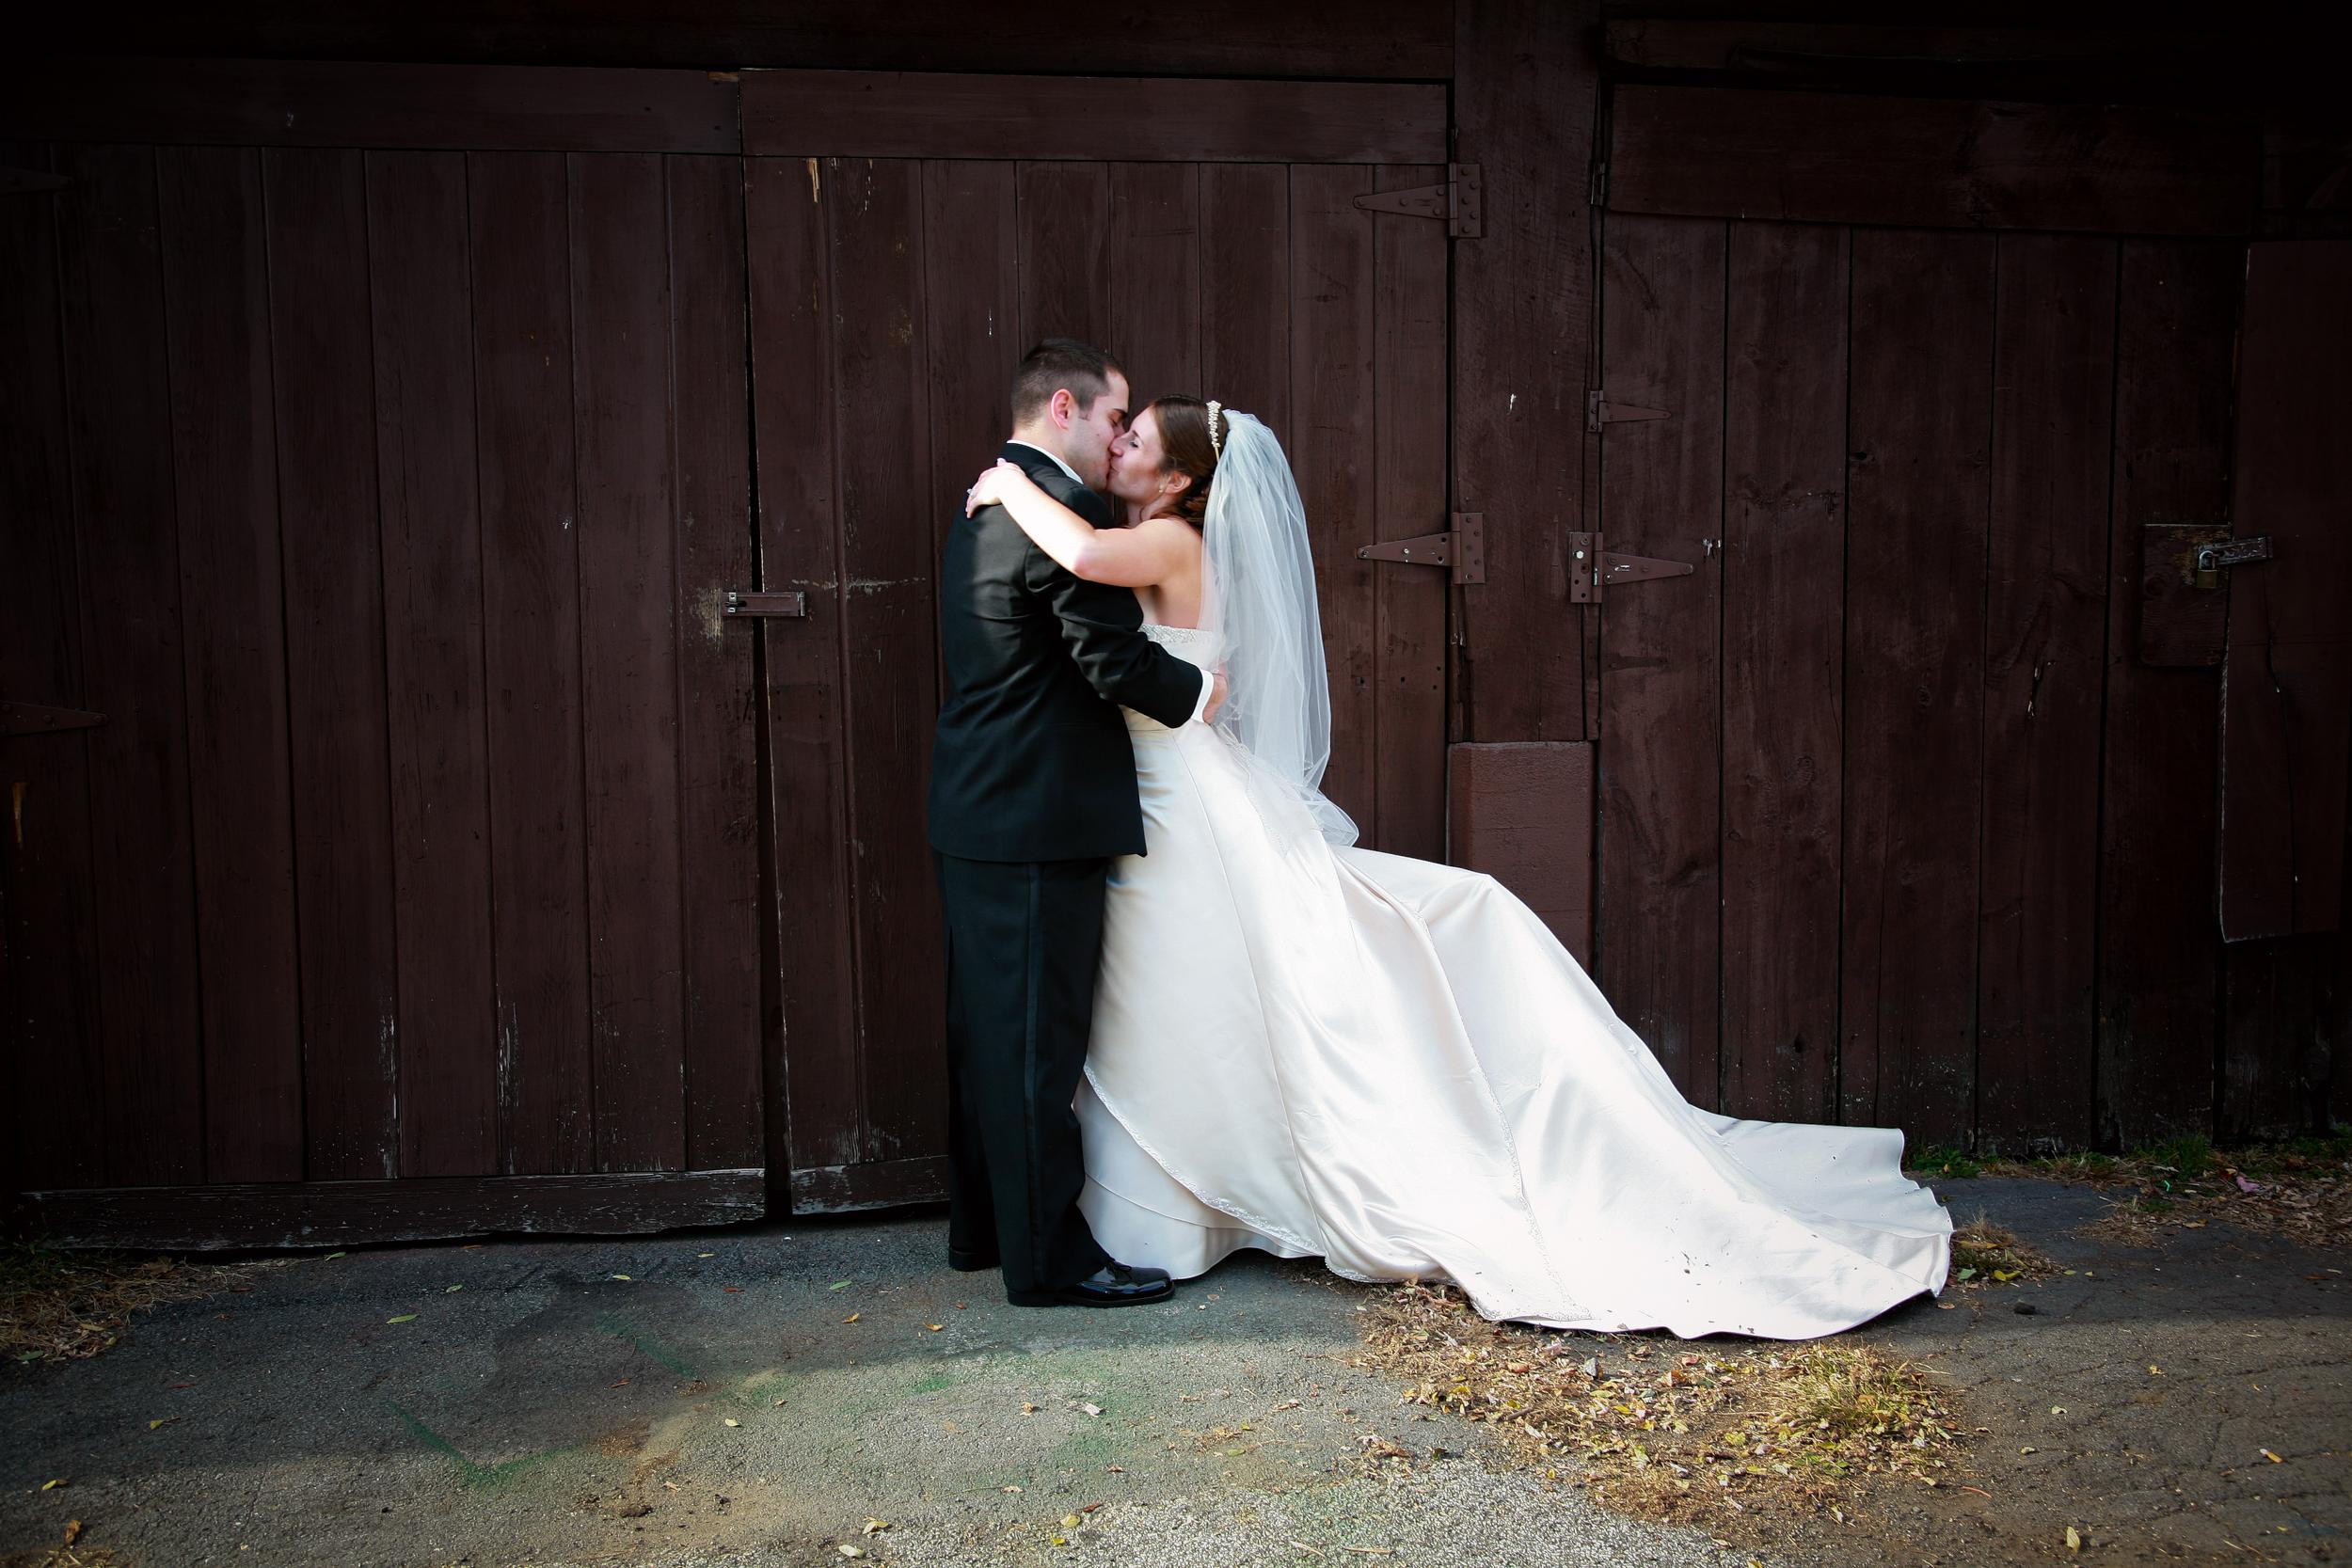 Wedding photo at an old barn.